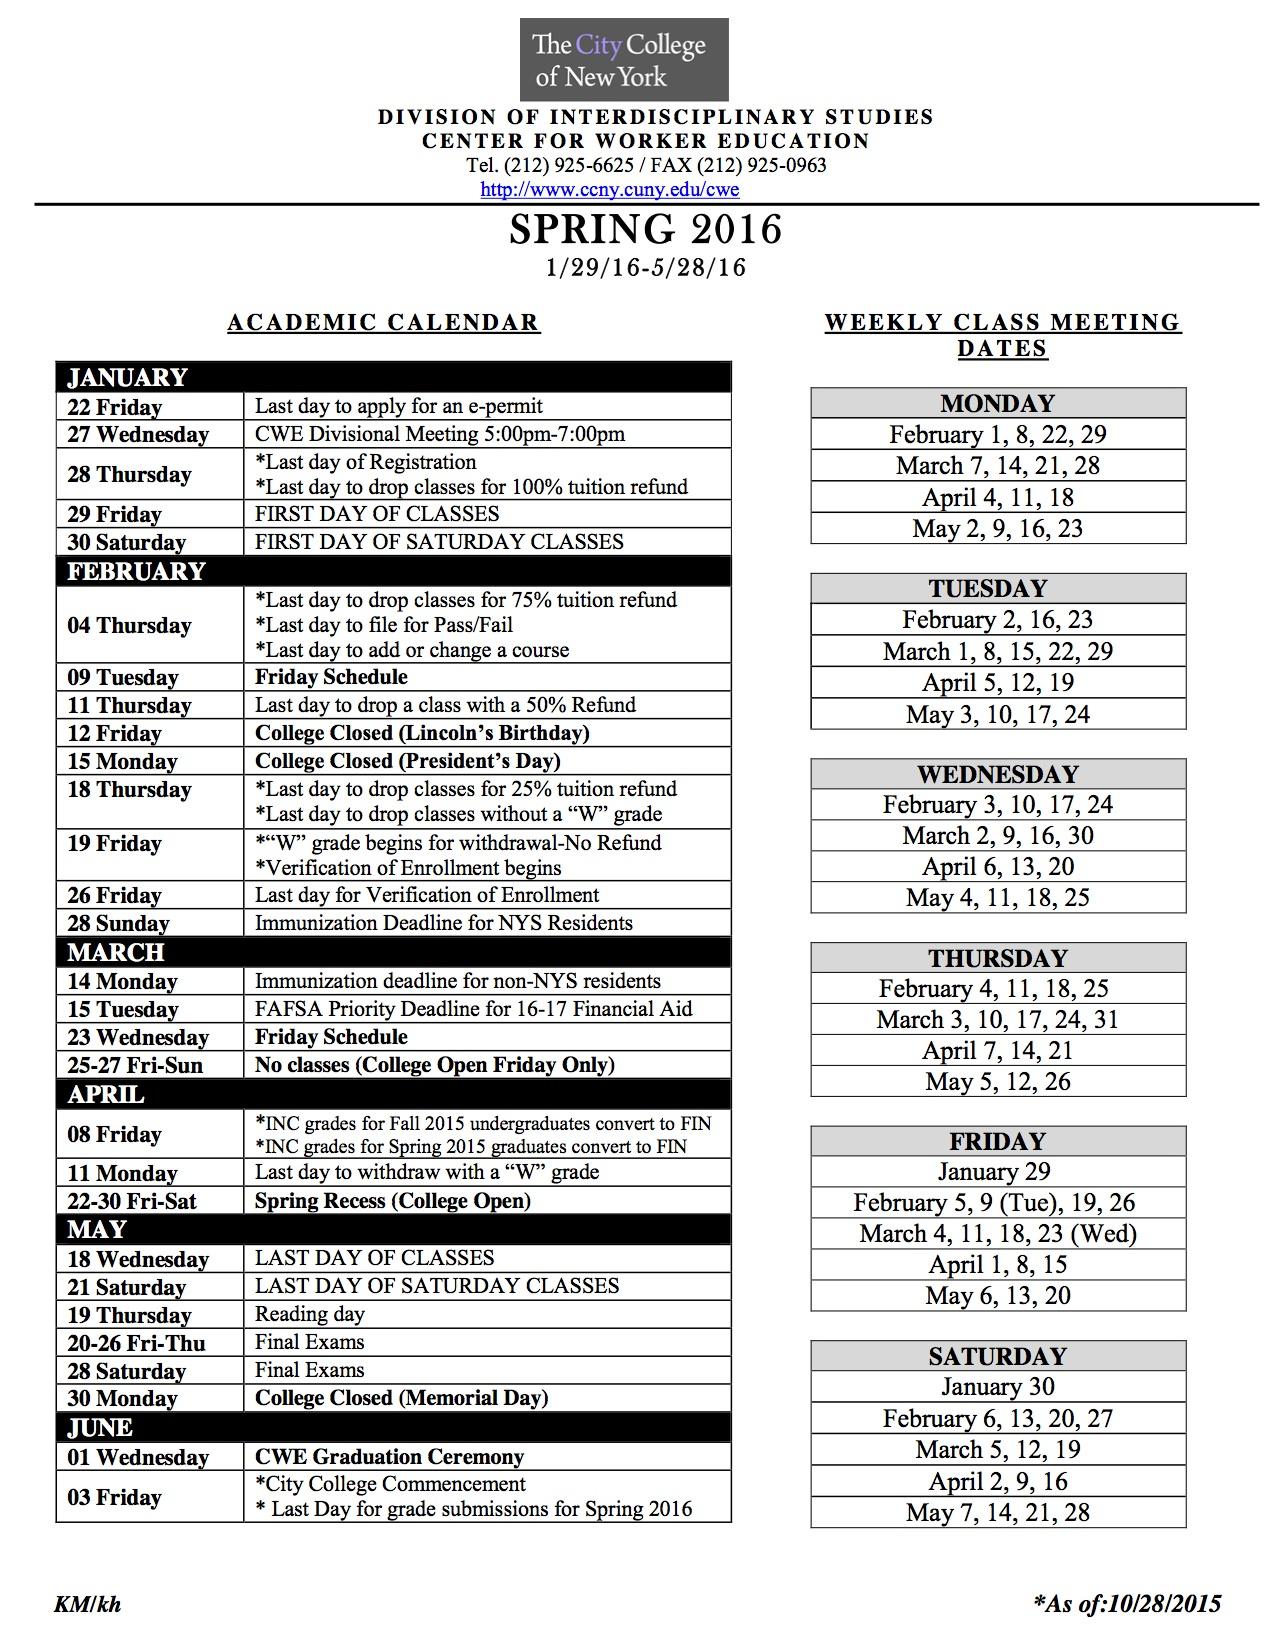 Academic Calendar | The City College Of New York Regarding Nassau Community College Acacemic Calendar